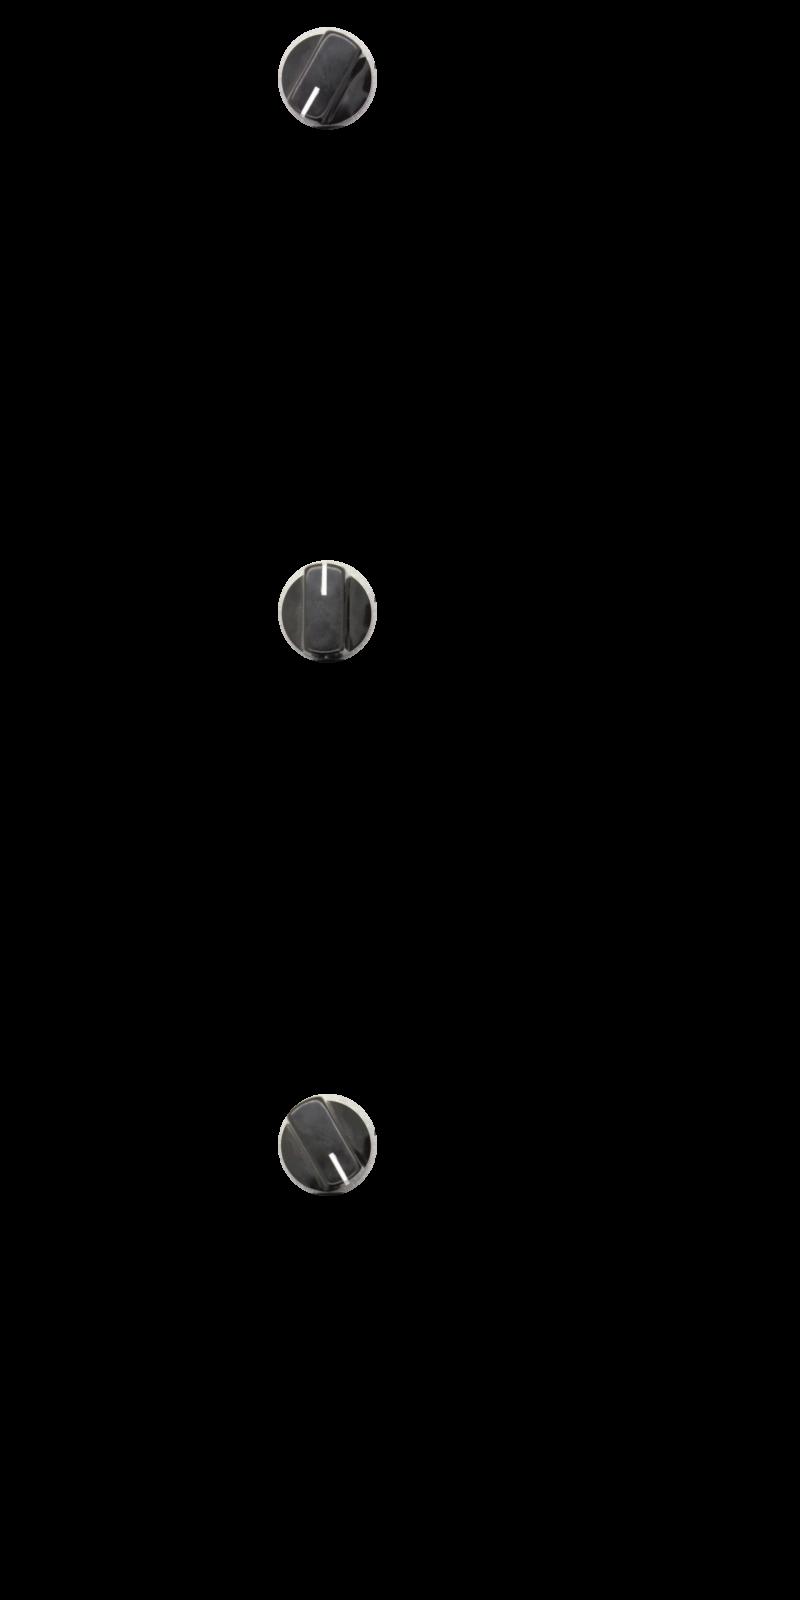 SPECTRON-DRV